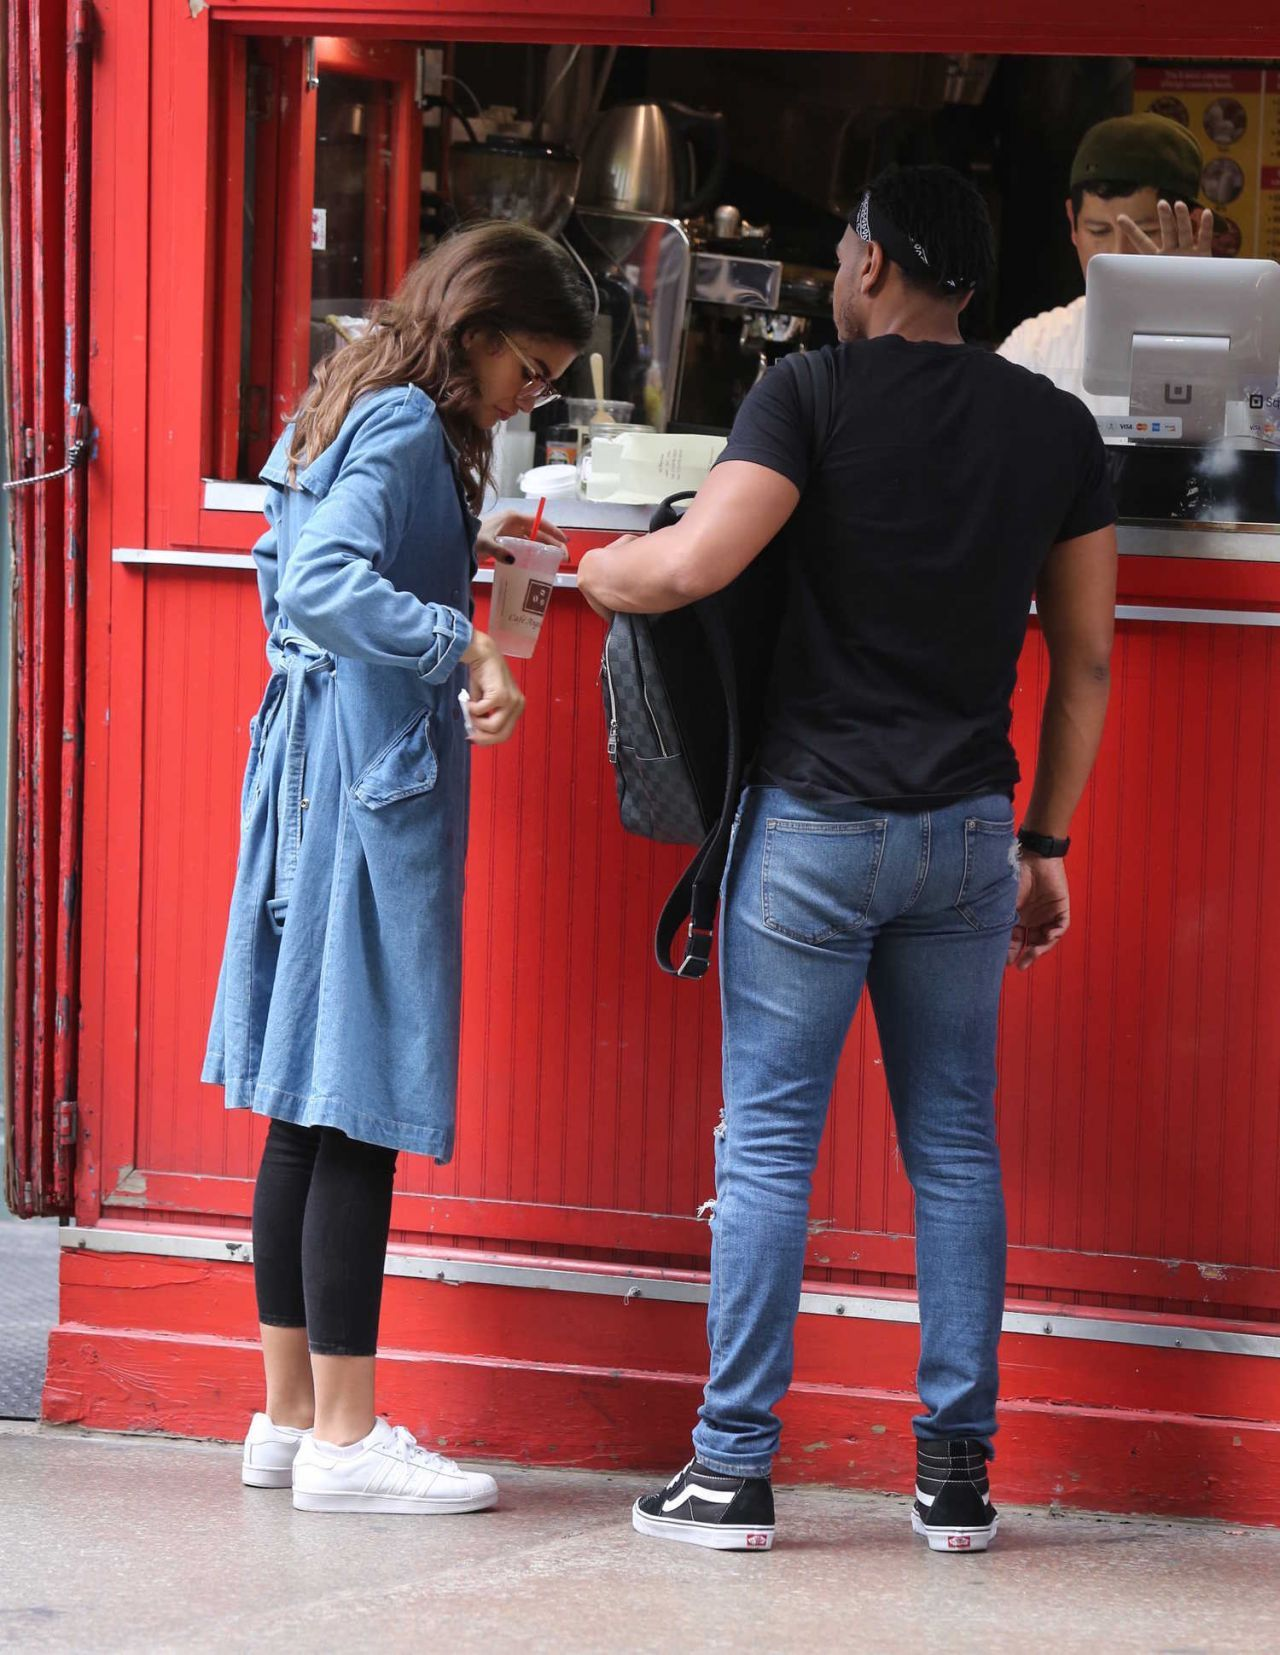 Zendaya Coleman Street Style – Shopping NYC 10/05/2017 #Shopping #Style #Zendaya #ZendayaColeman